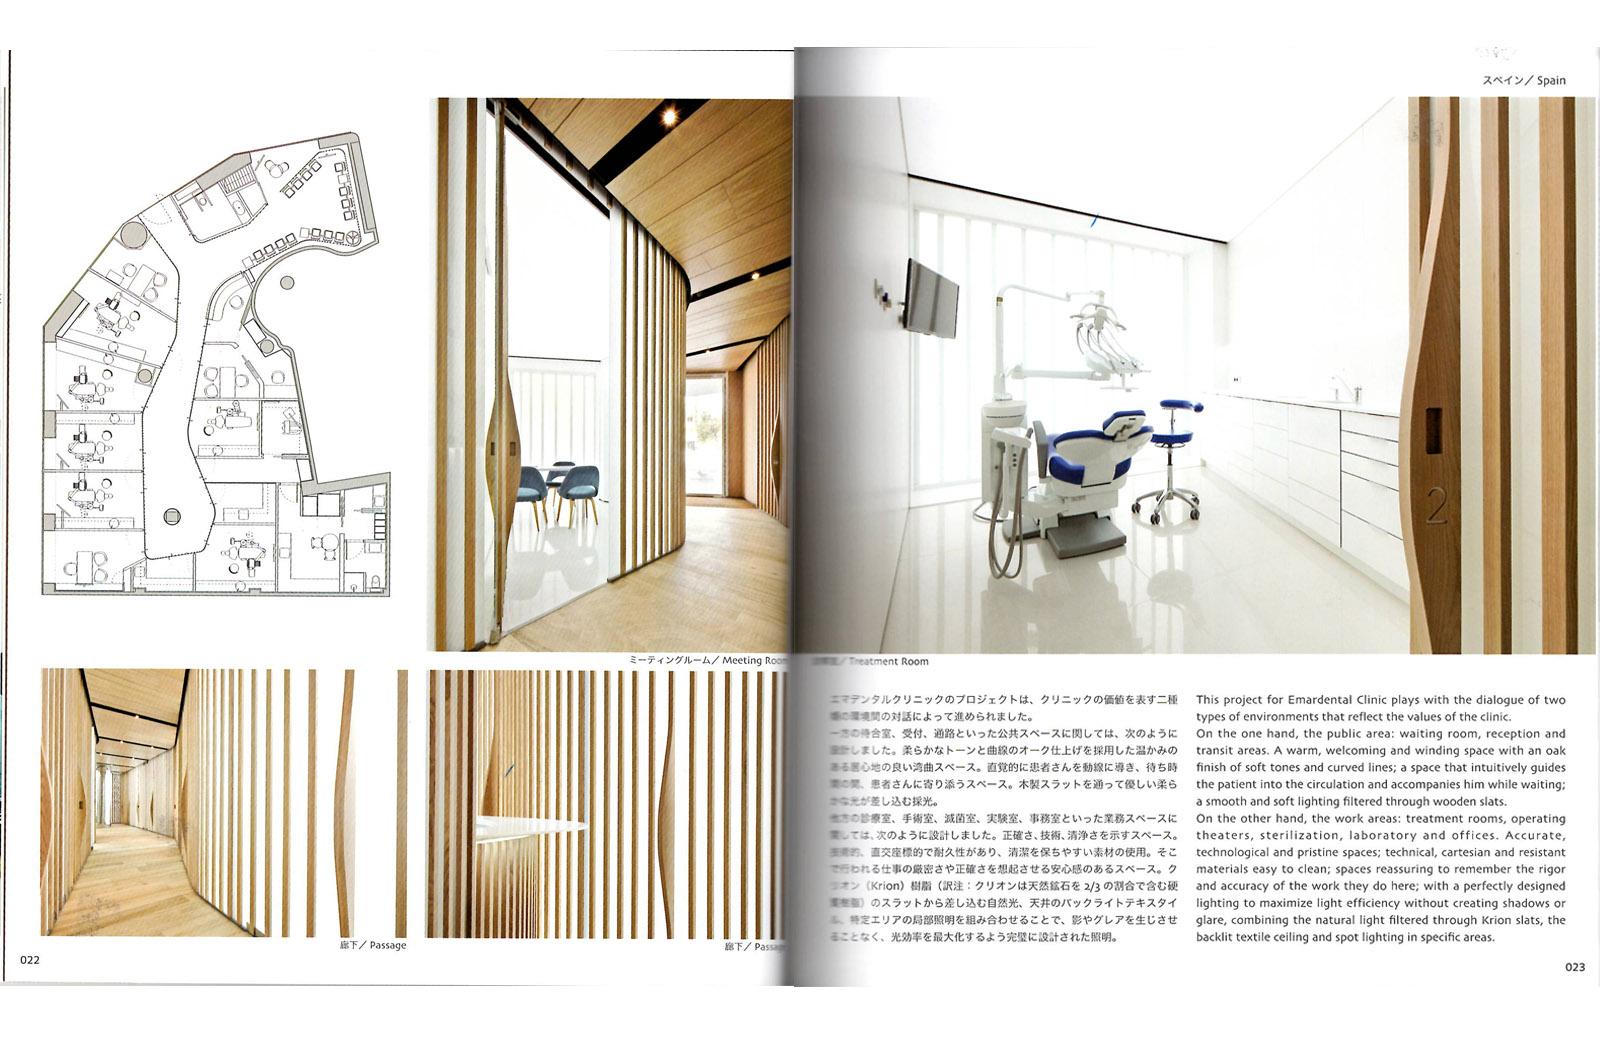 world-dental-clinic-design_emardental_02